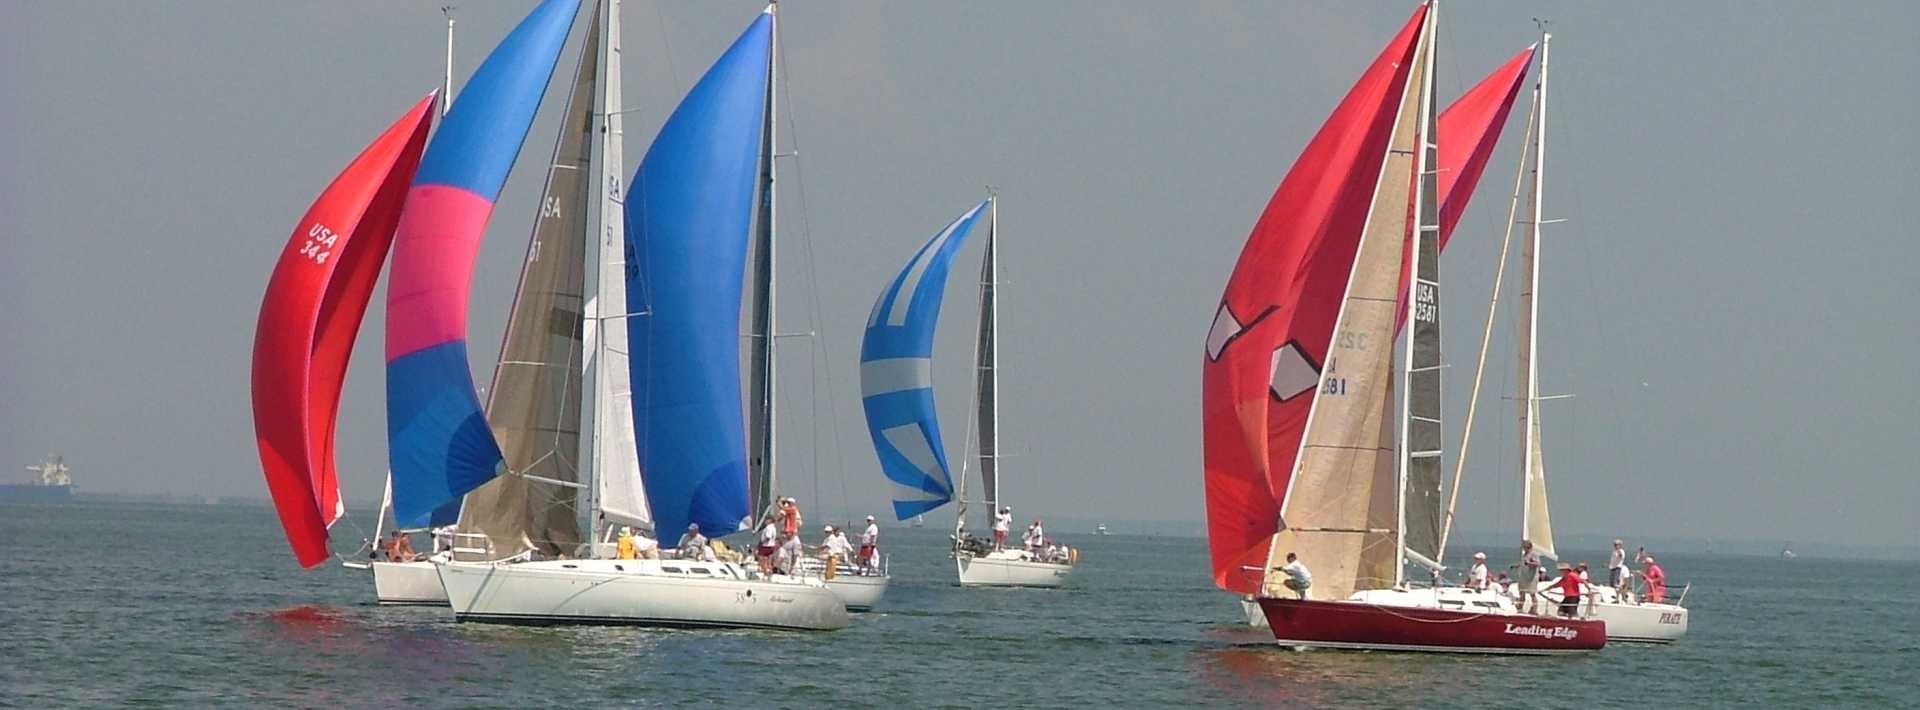 Sailboats on Galveston Bay